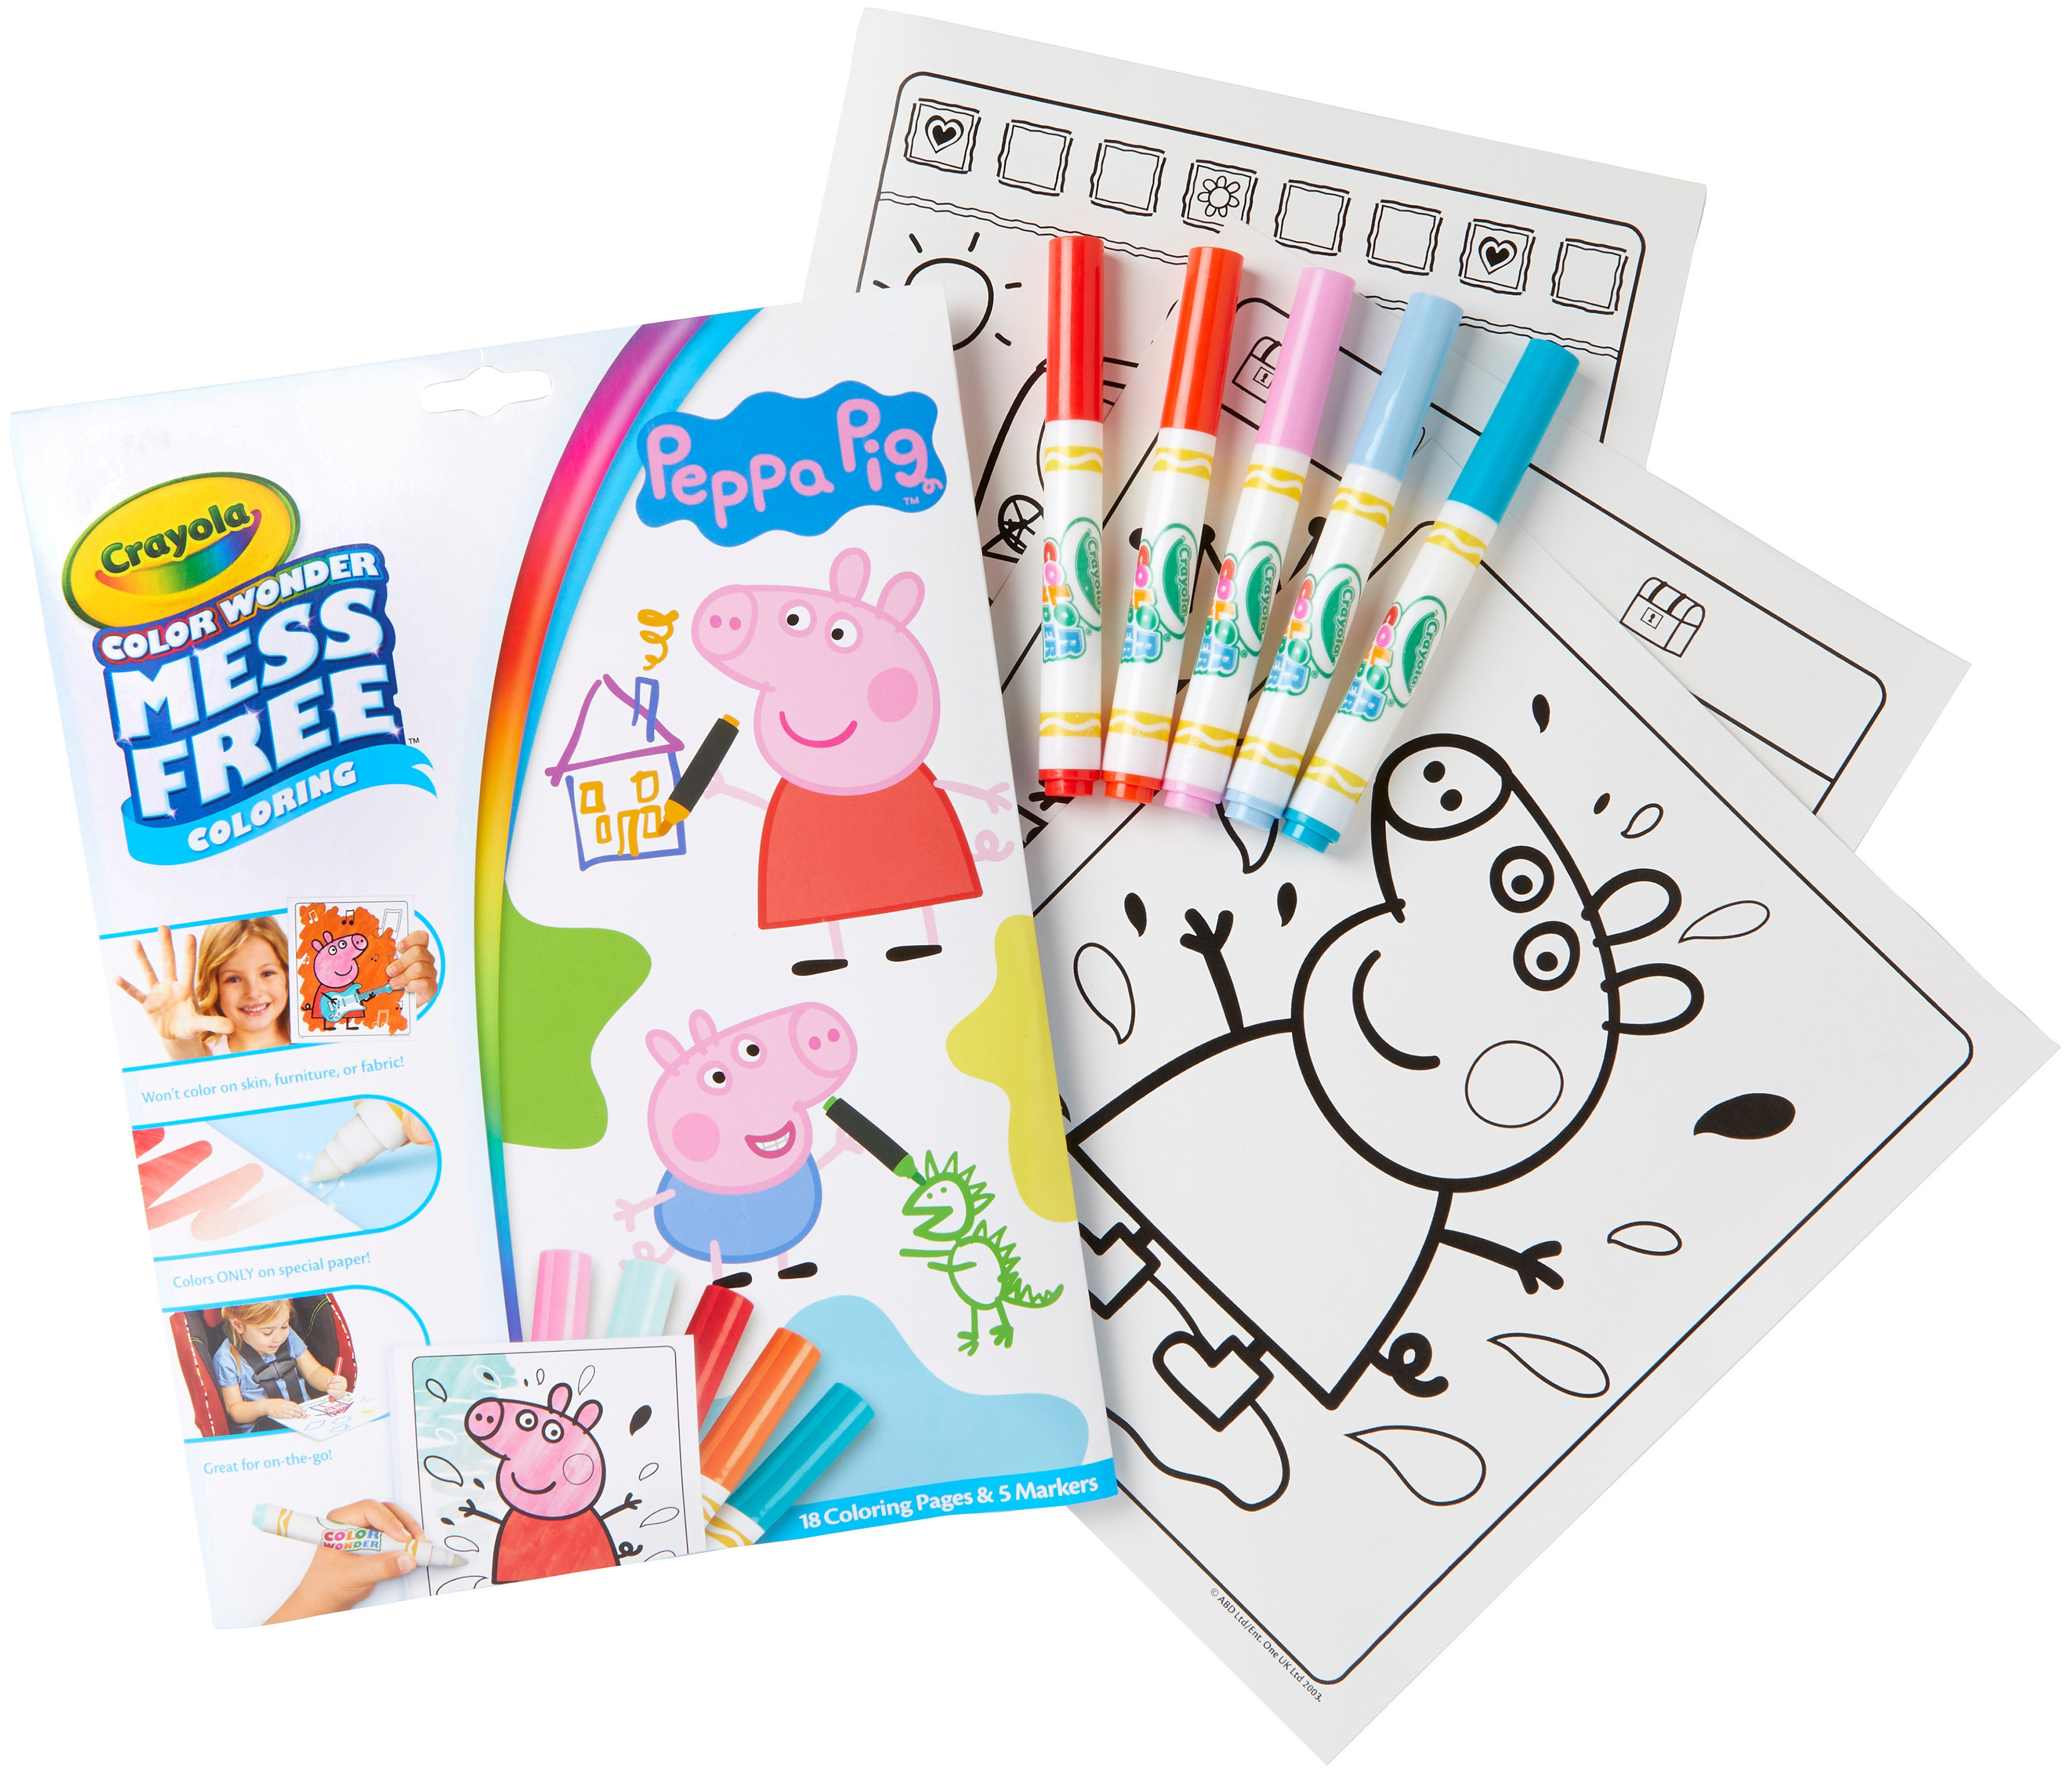 Crayola Color Wonder Coloring Pad & Markers-Peppa Pig